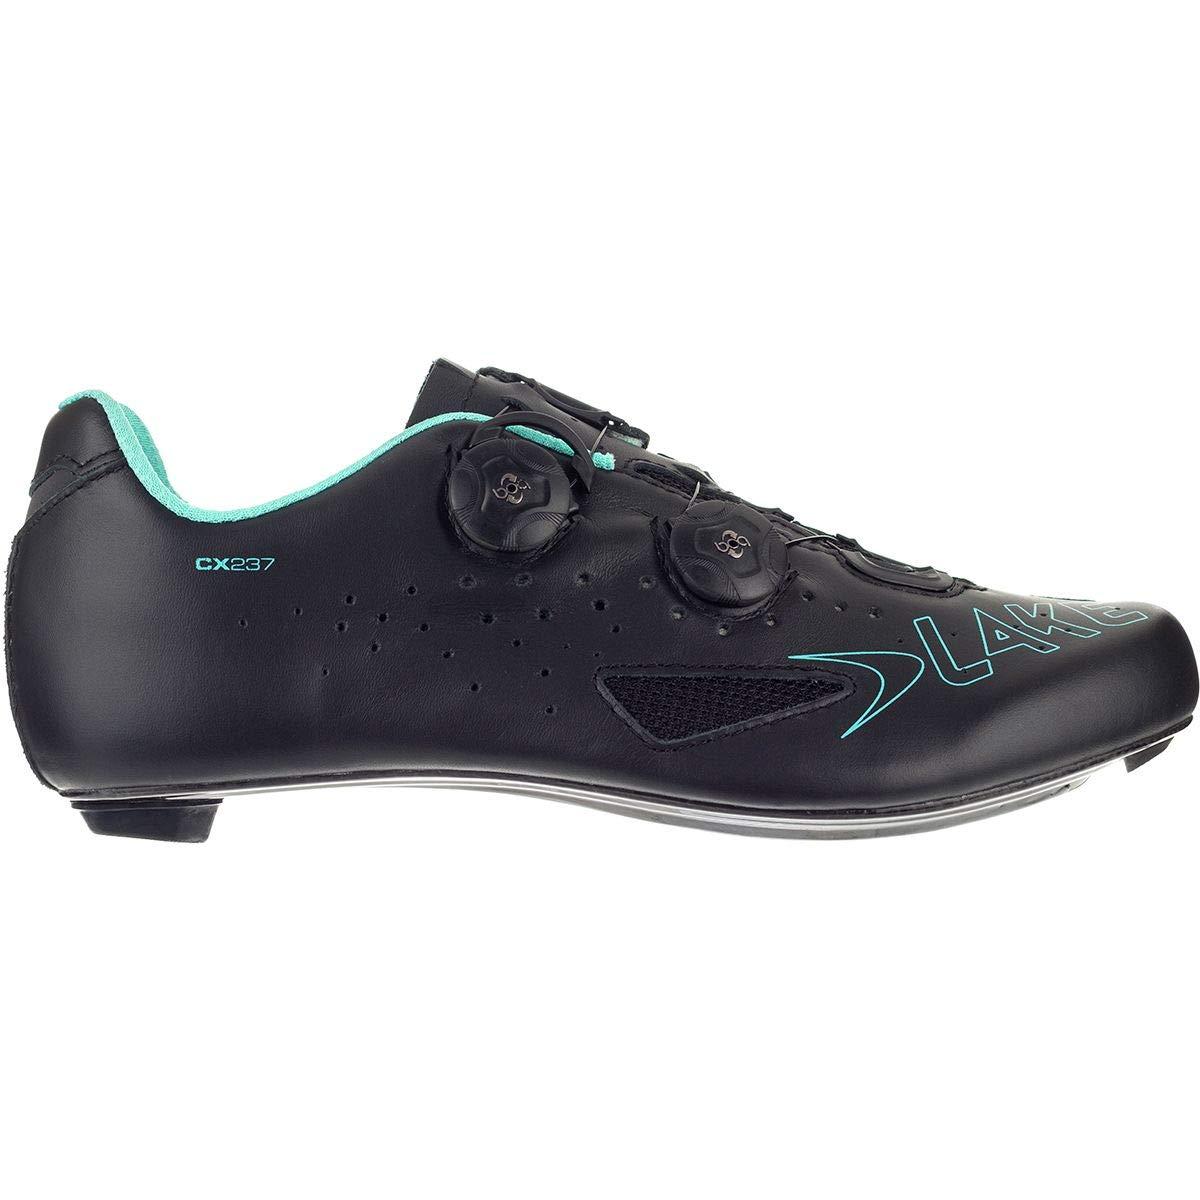 Noir bleu Lake Cx237 Route Carbone Twin Boa Road Chaussures, Noir Bleu 43 EU